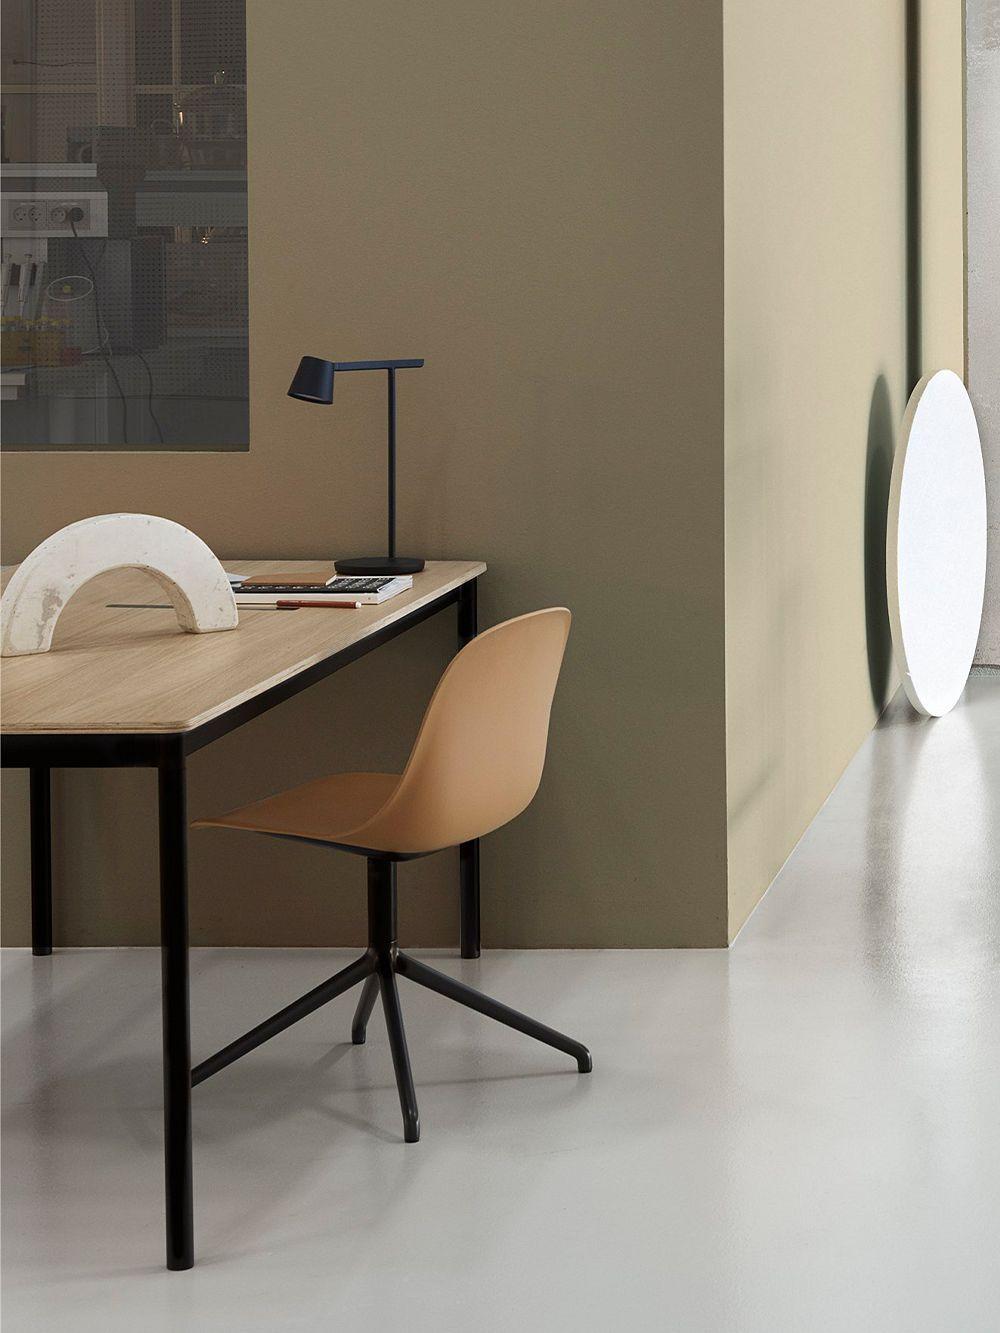 Muuto: Fiber chair